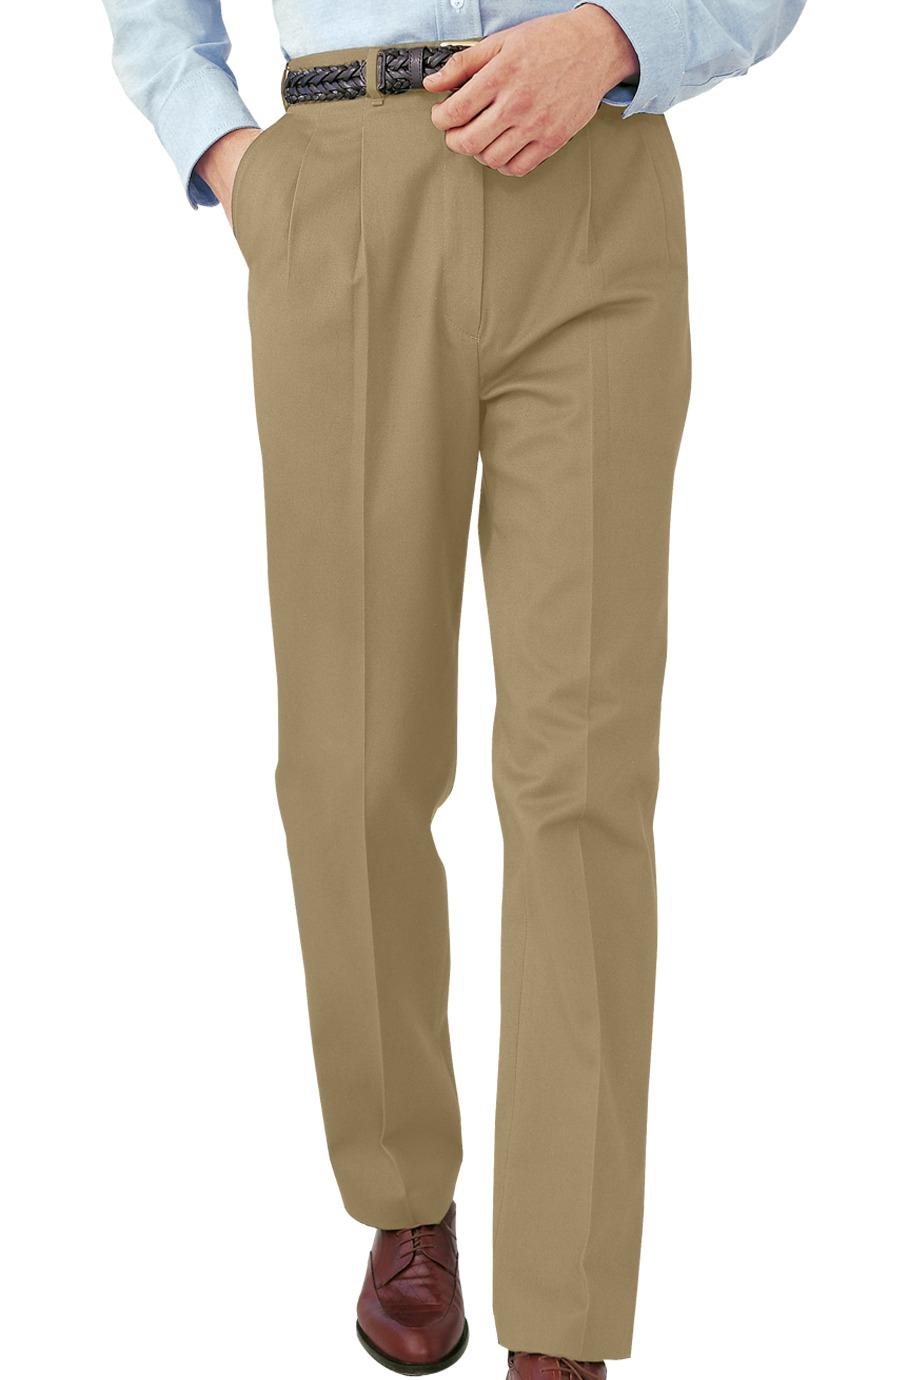 046cd0bcb48 Edwards Garment 2630 - Men s All Cotton Pleated Pant